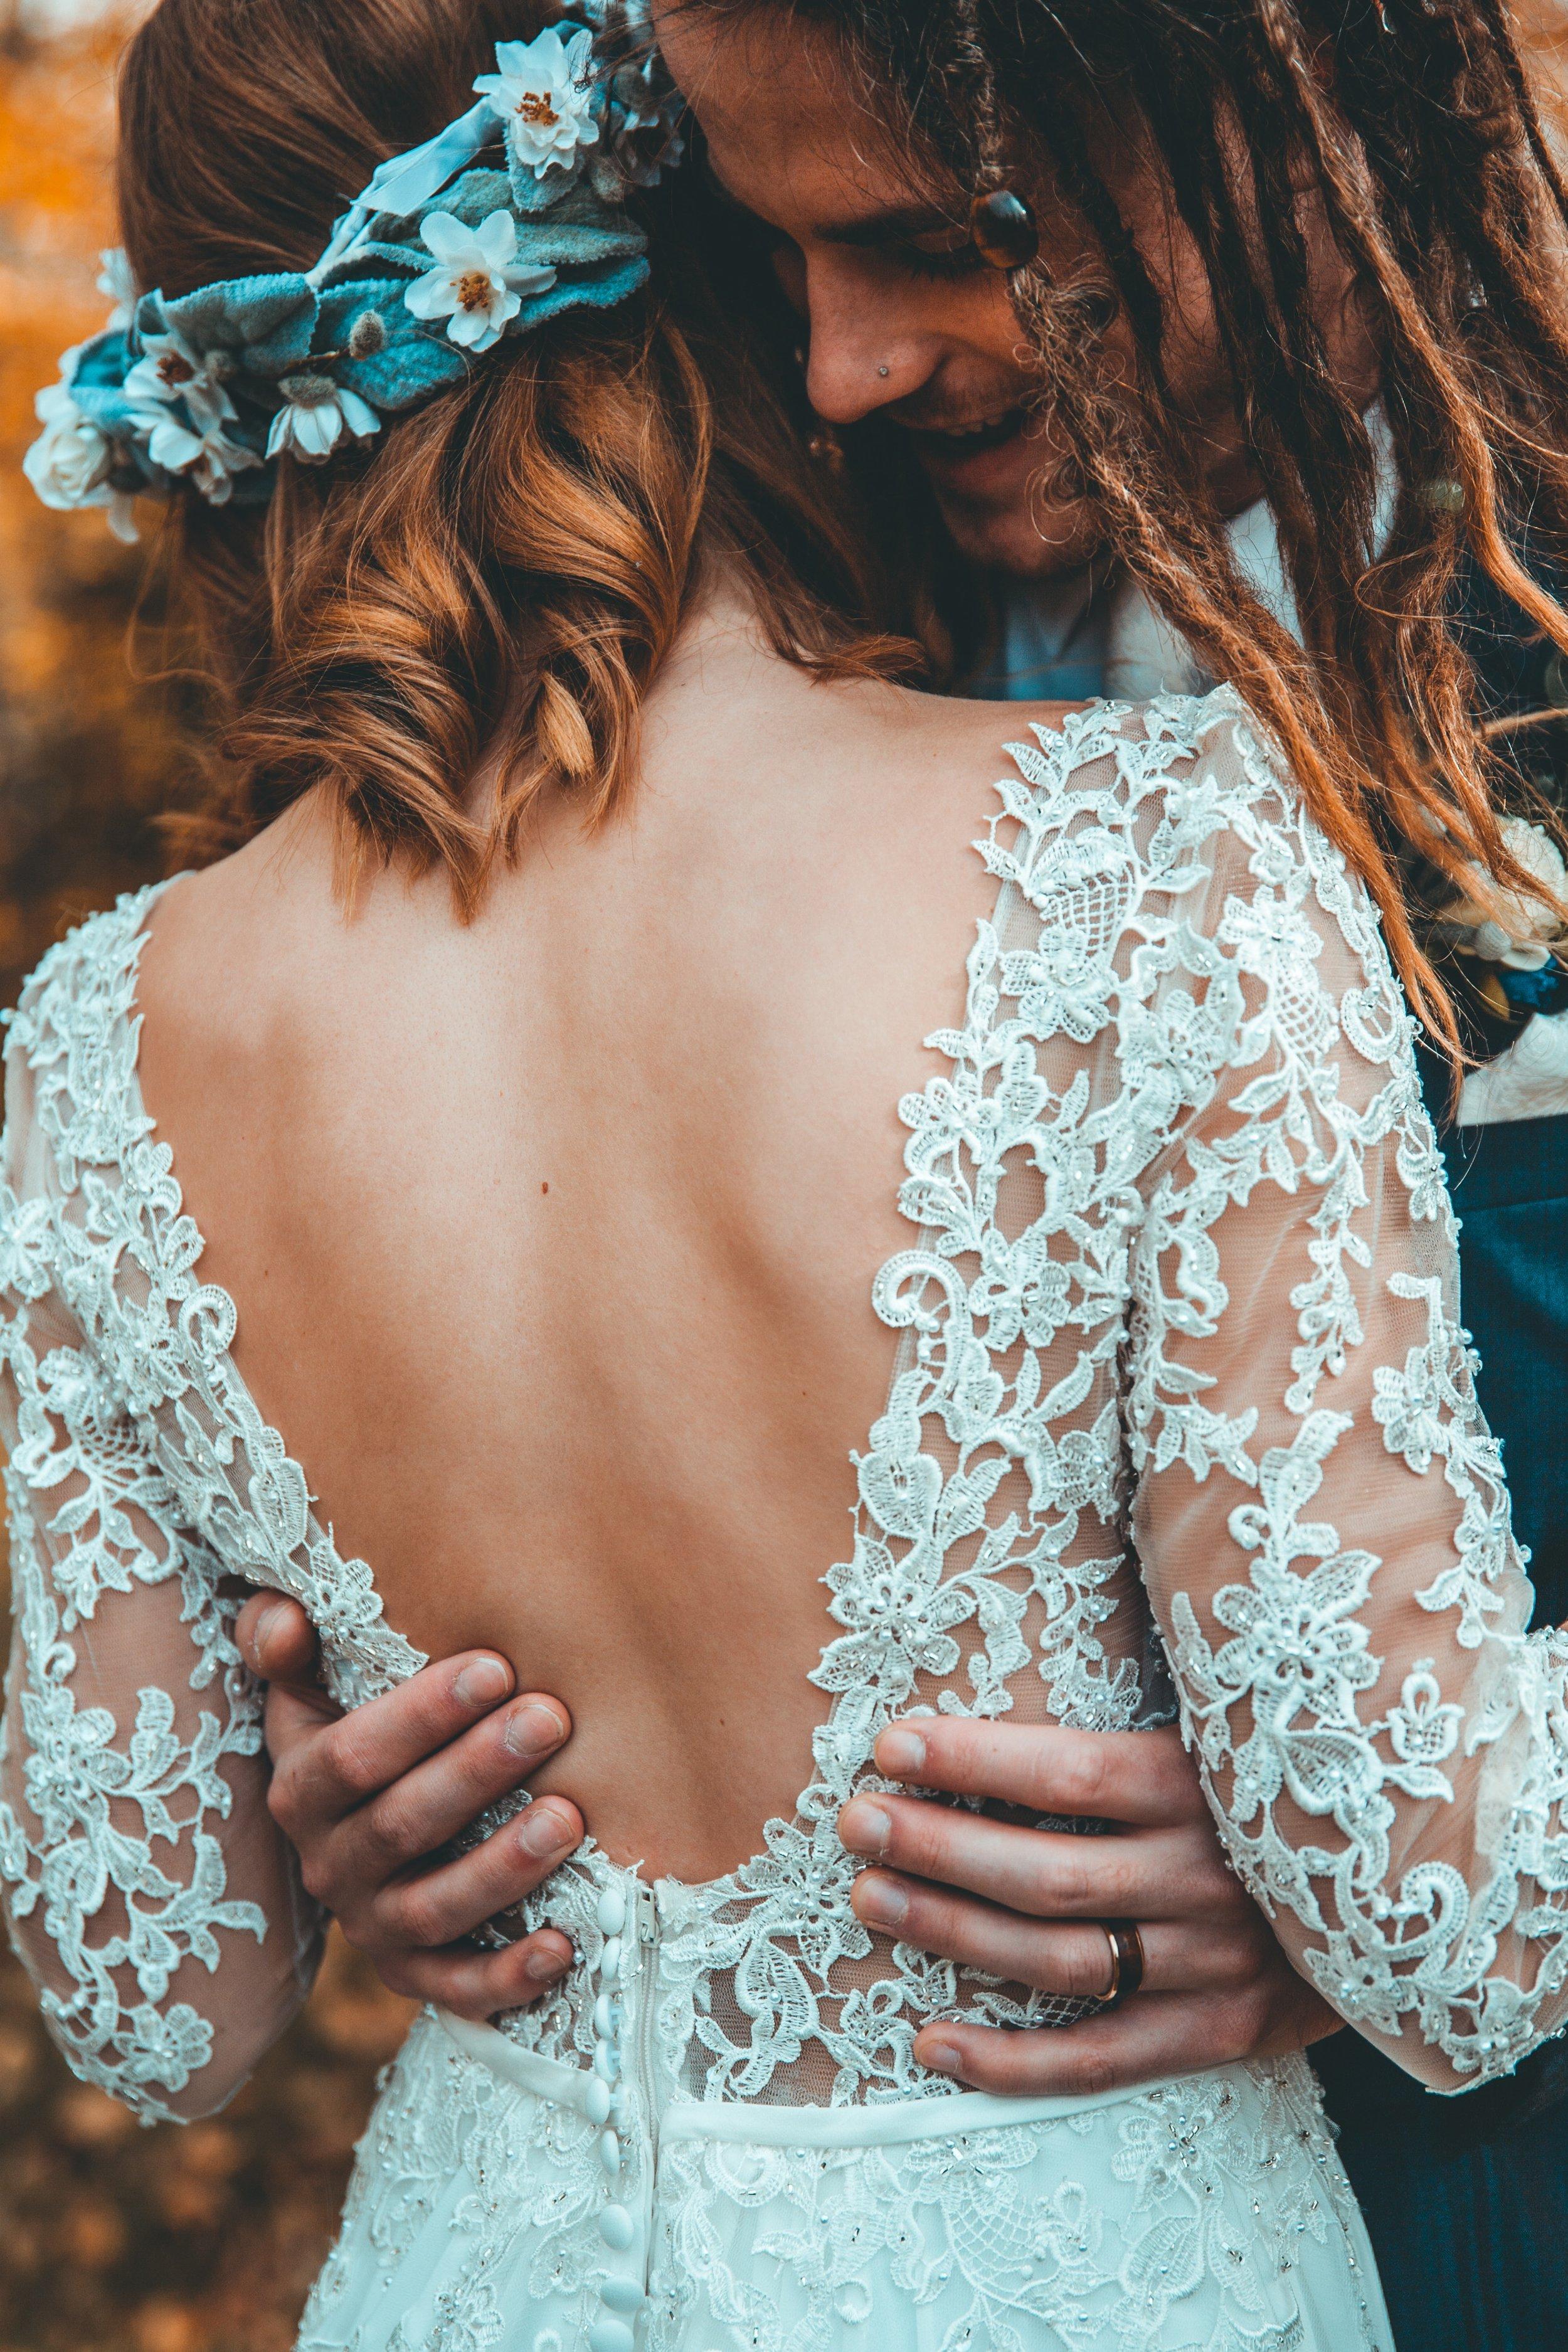 Bay Area Wedding Planner Bohemian Ceremony Headpiece Dreadlocks Flower Crown Gypsy Love Katie Laines Design and Coordination